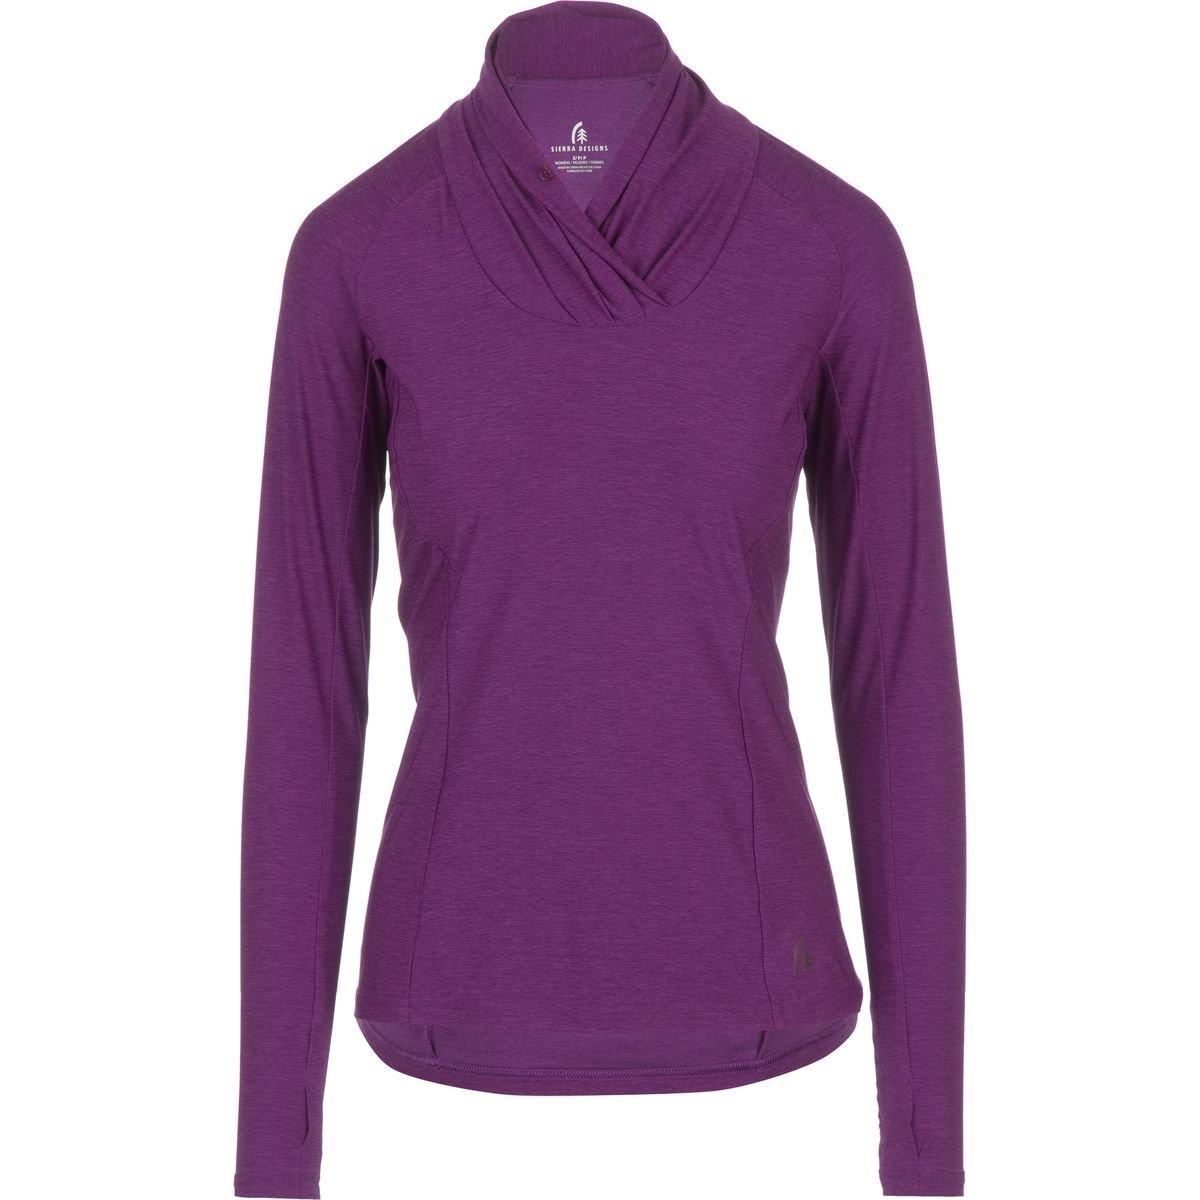 895a909b Amazon.com: Sierra Designs Long Sleeve Cowl Neck Top - Women's: Sports &  Outdoors